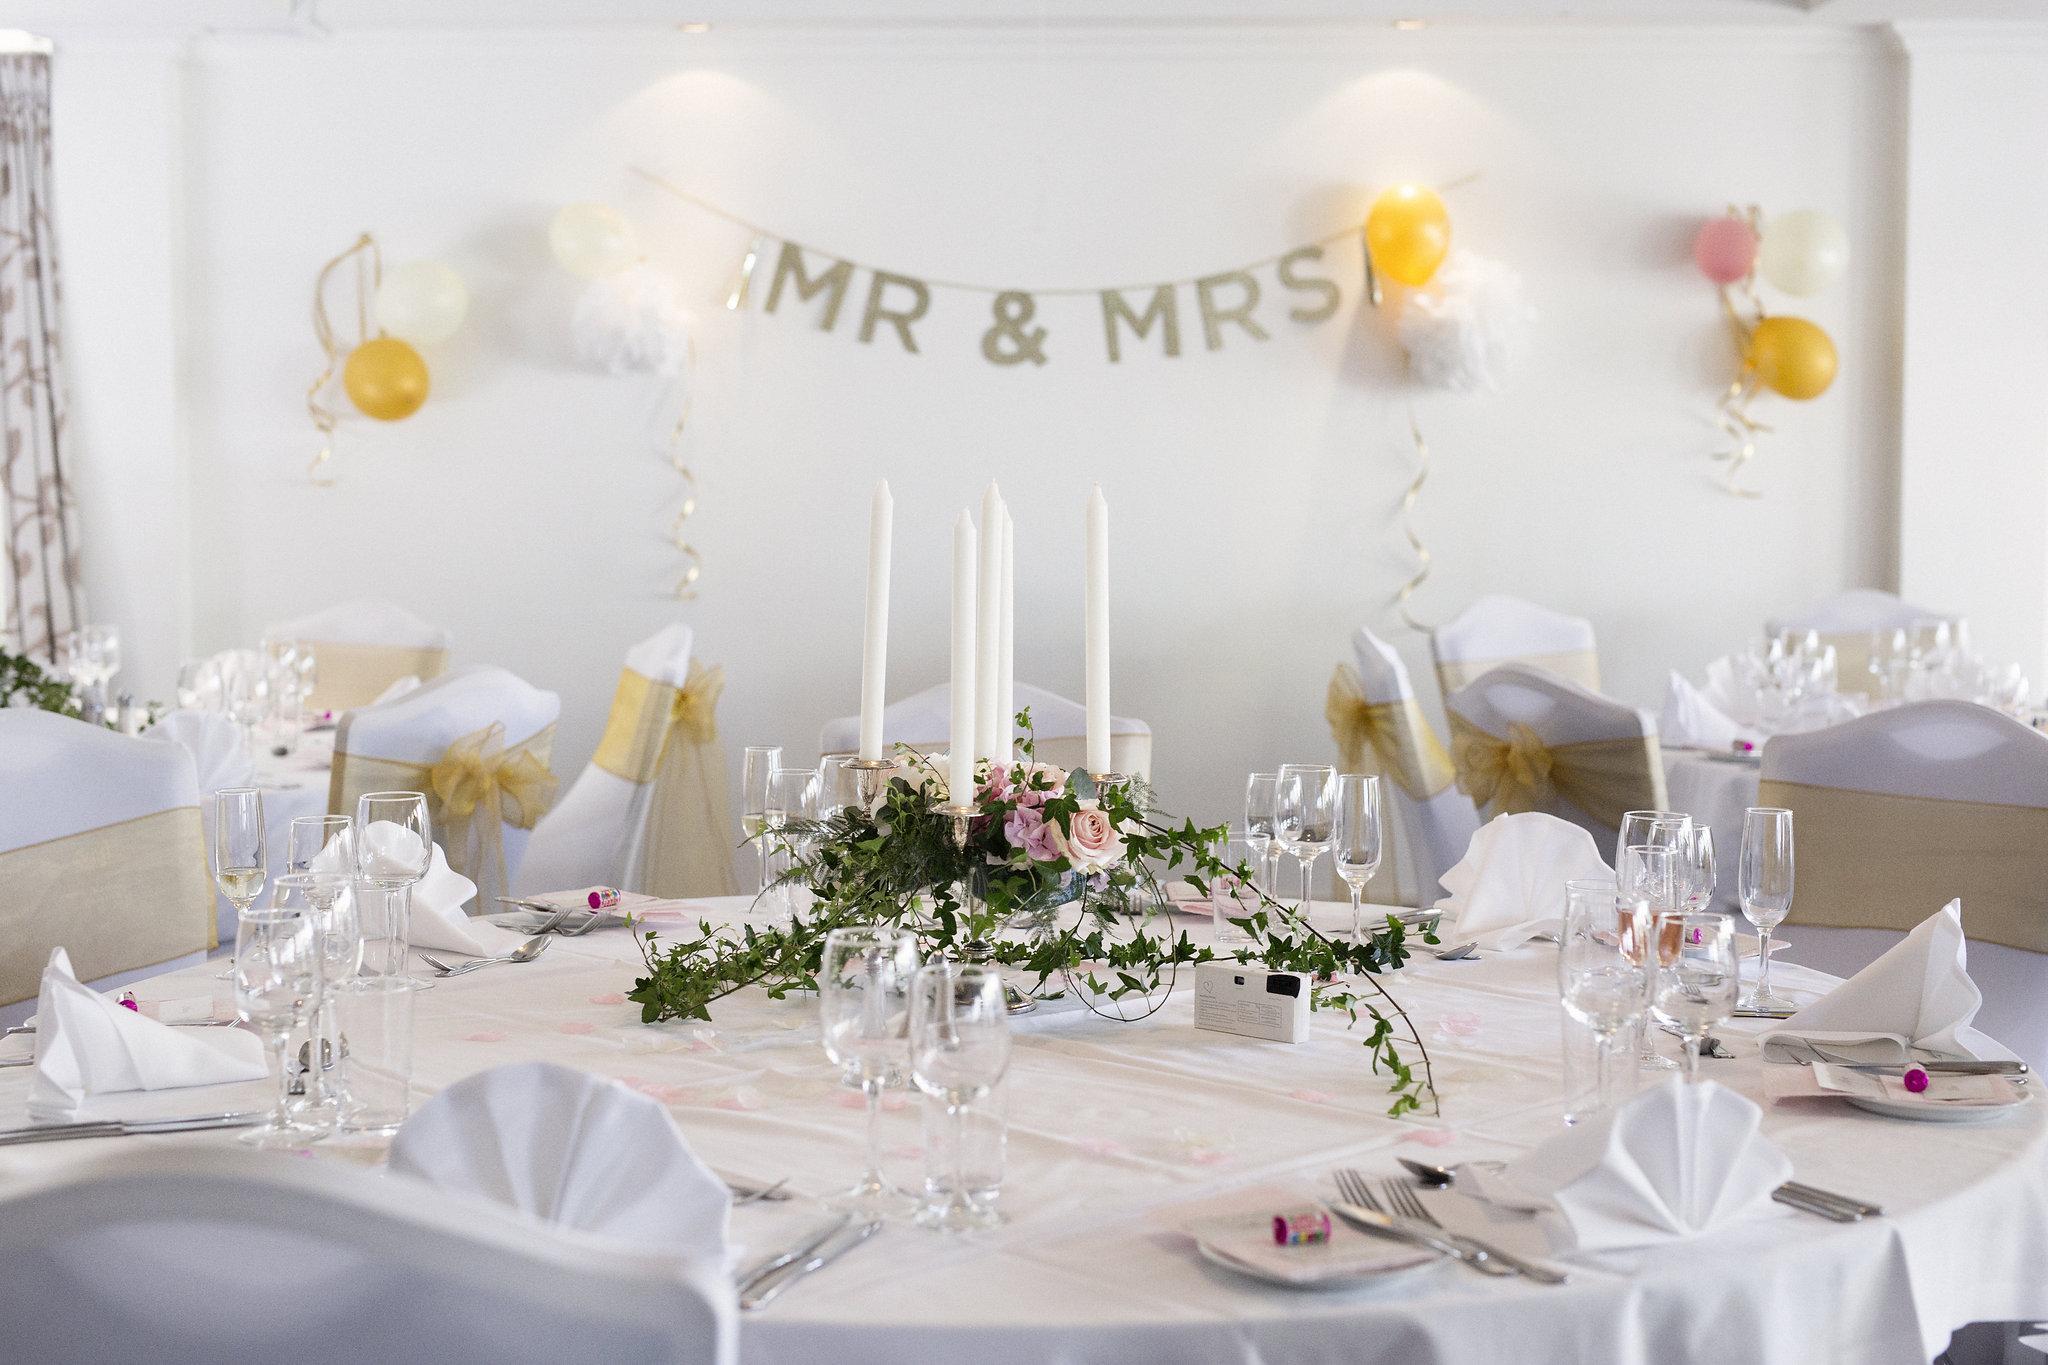 AL_1308_0343-STfotograf-bryllup-tyrifjorden.jpg